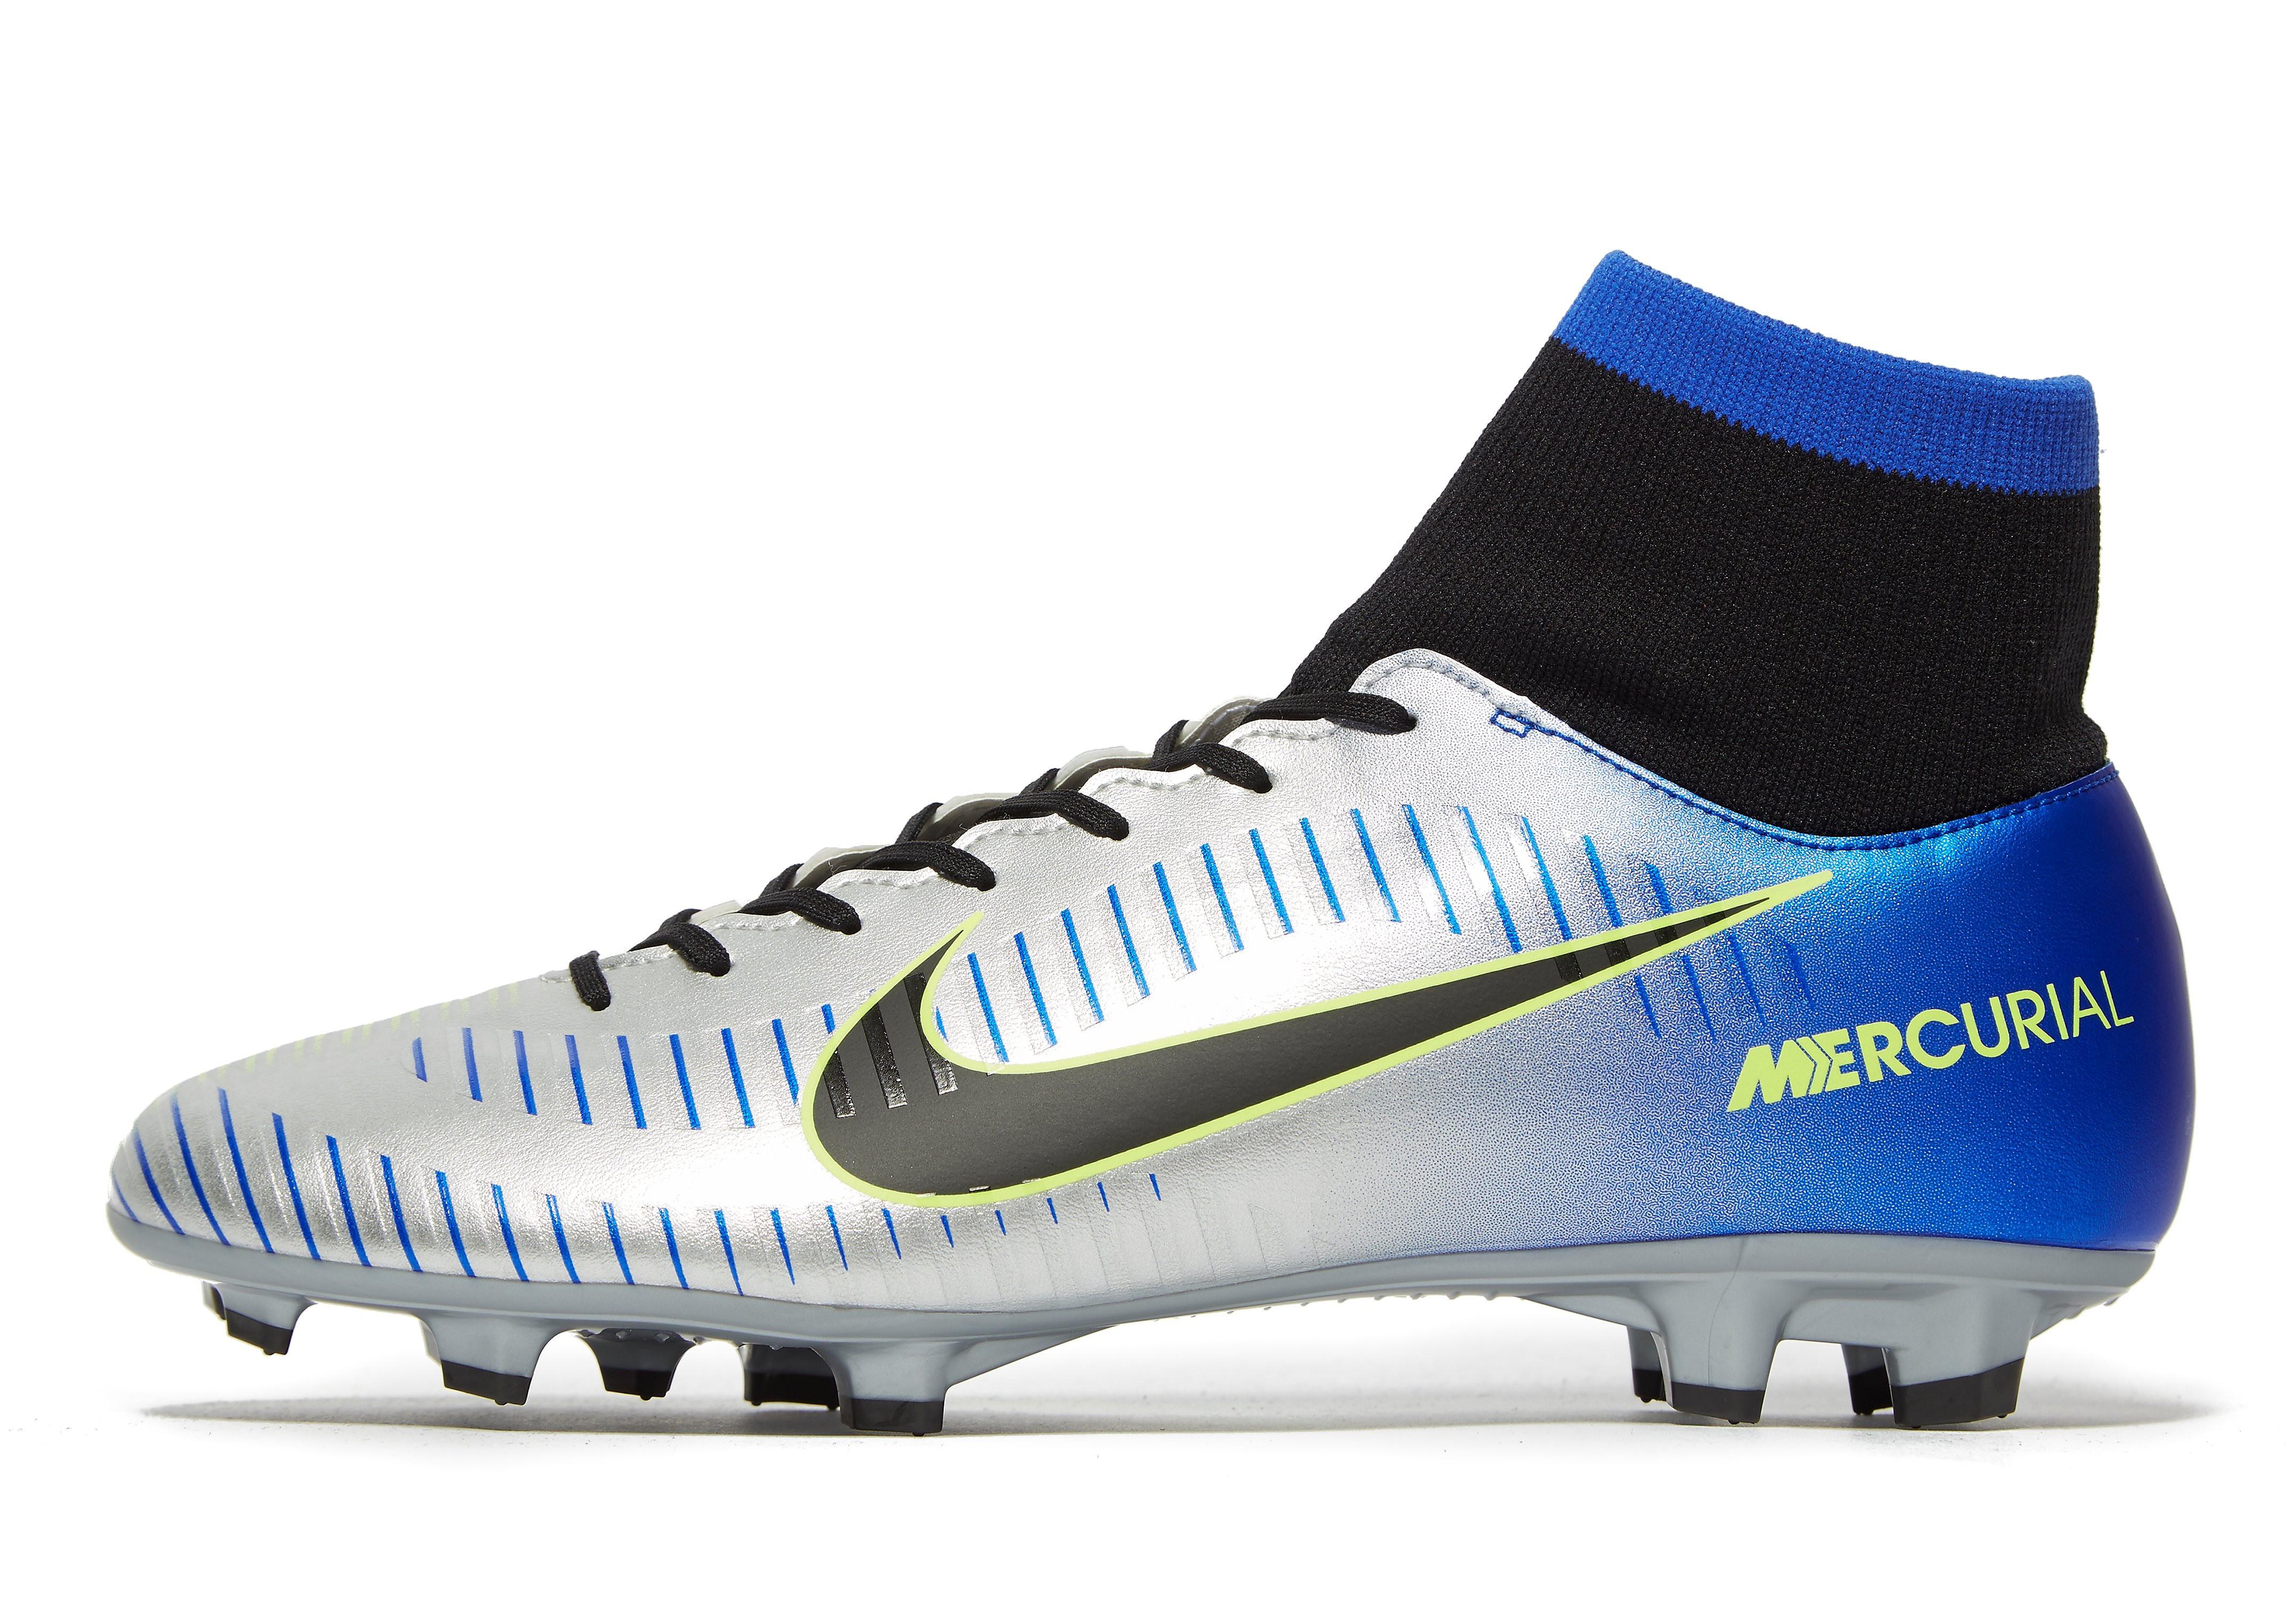 Nike Neymar Jr Mercurial Victory Dynamic Fit FG Homme